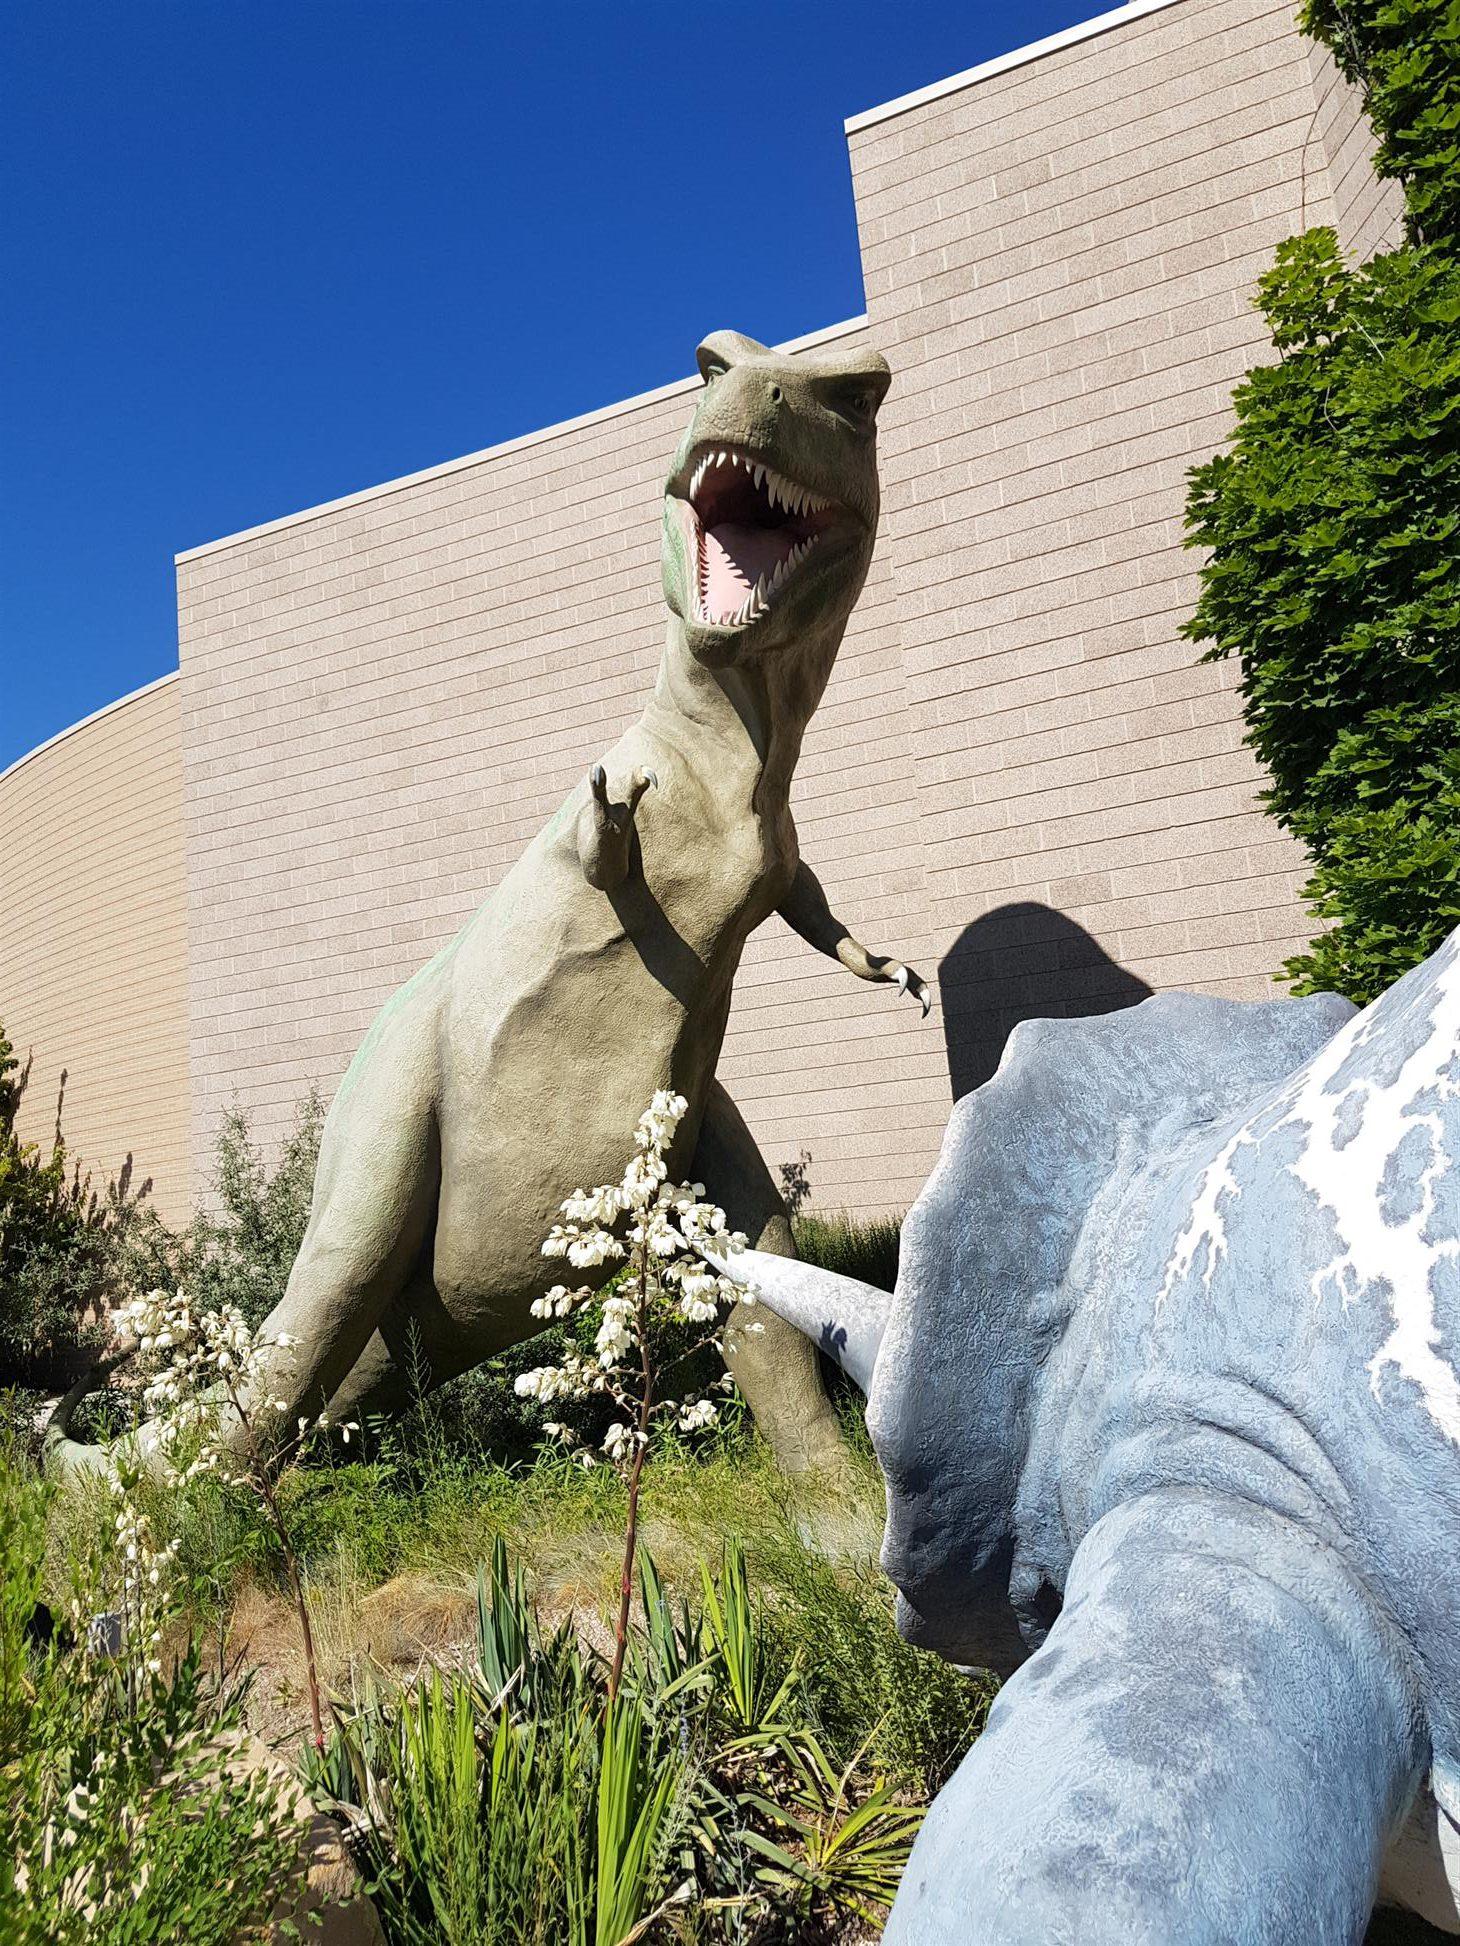 Utah Field House of Natural History Museum